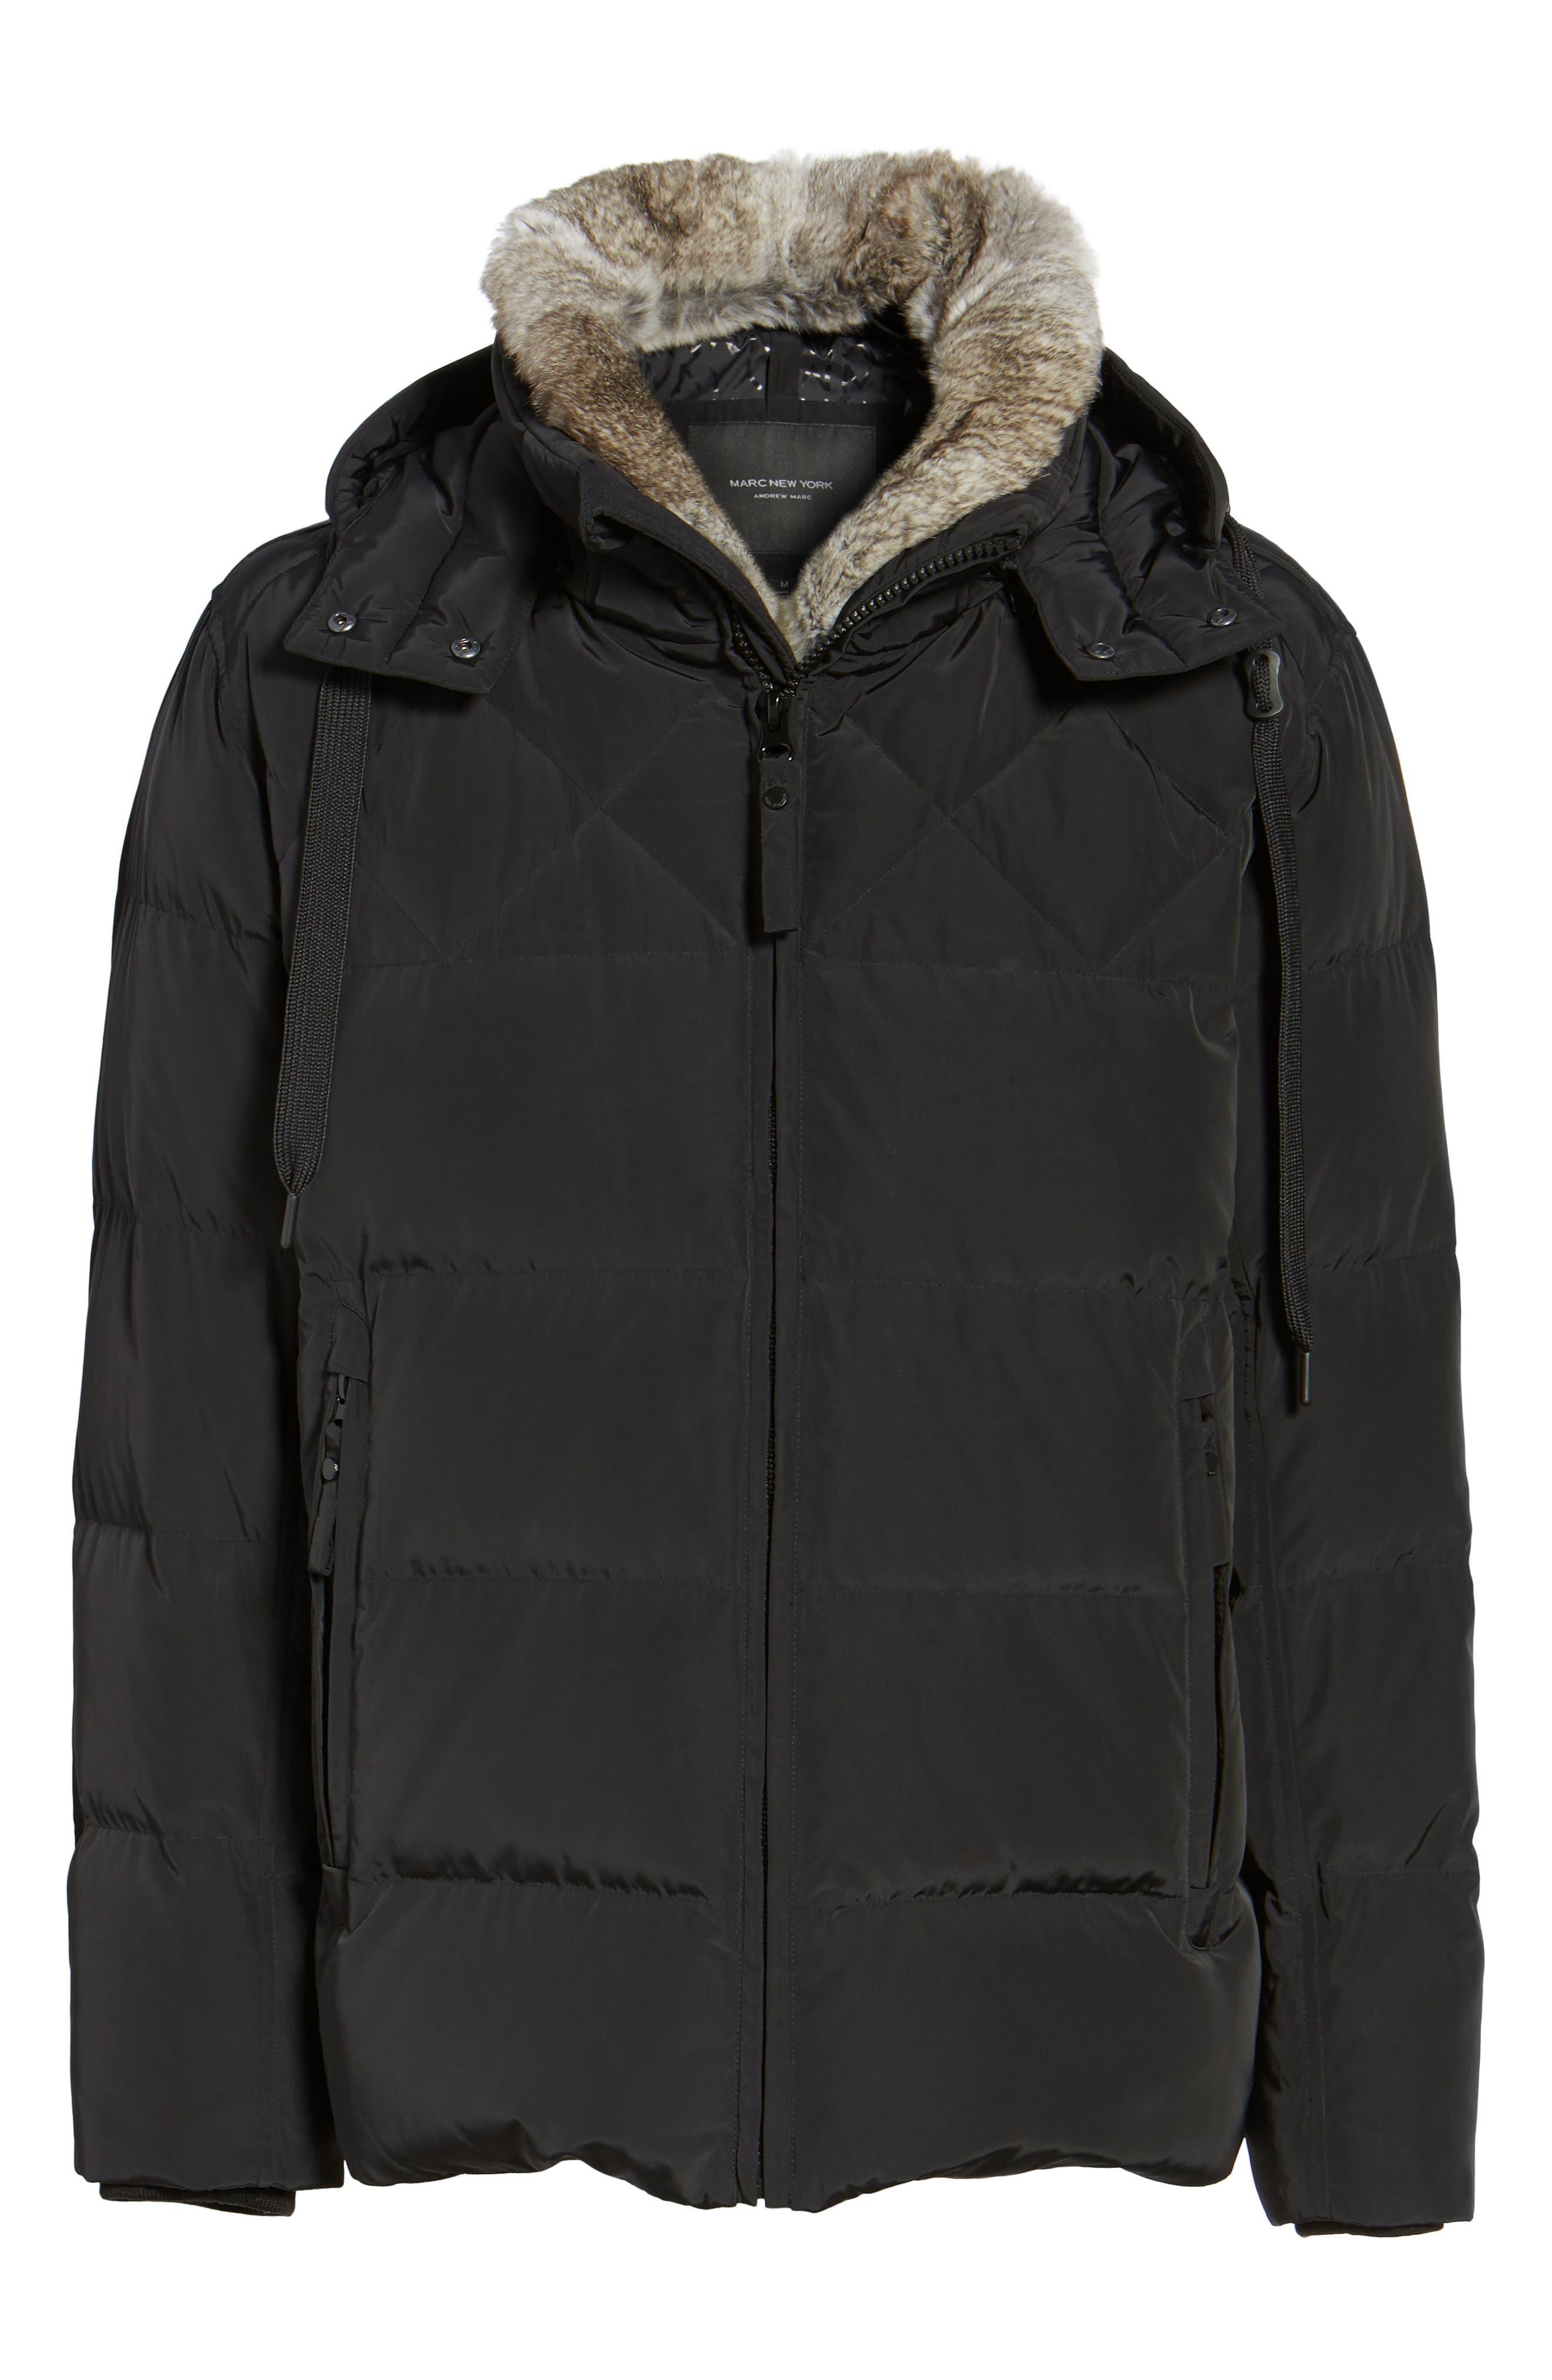 Navan Quilted Down Jacket with Genuine Rabbit Fur Trim,                             Alternate thumbnail 5, color,                             Black